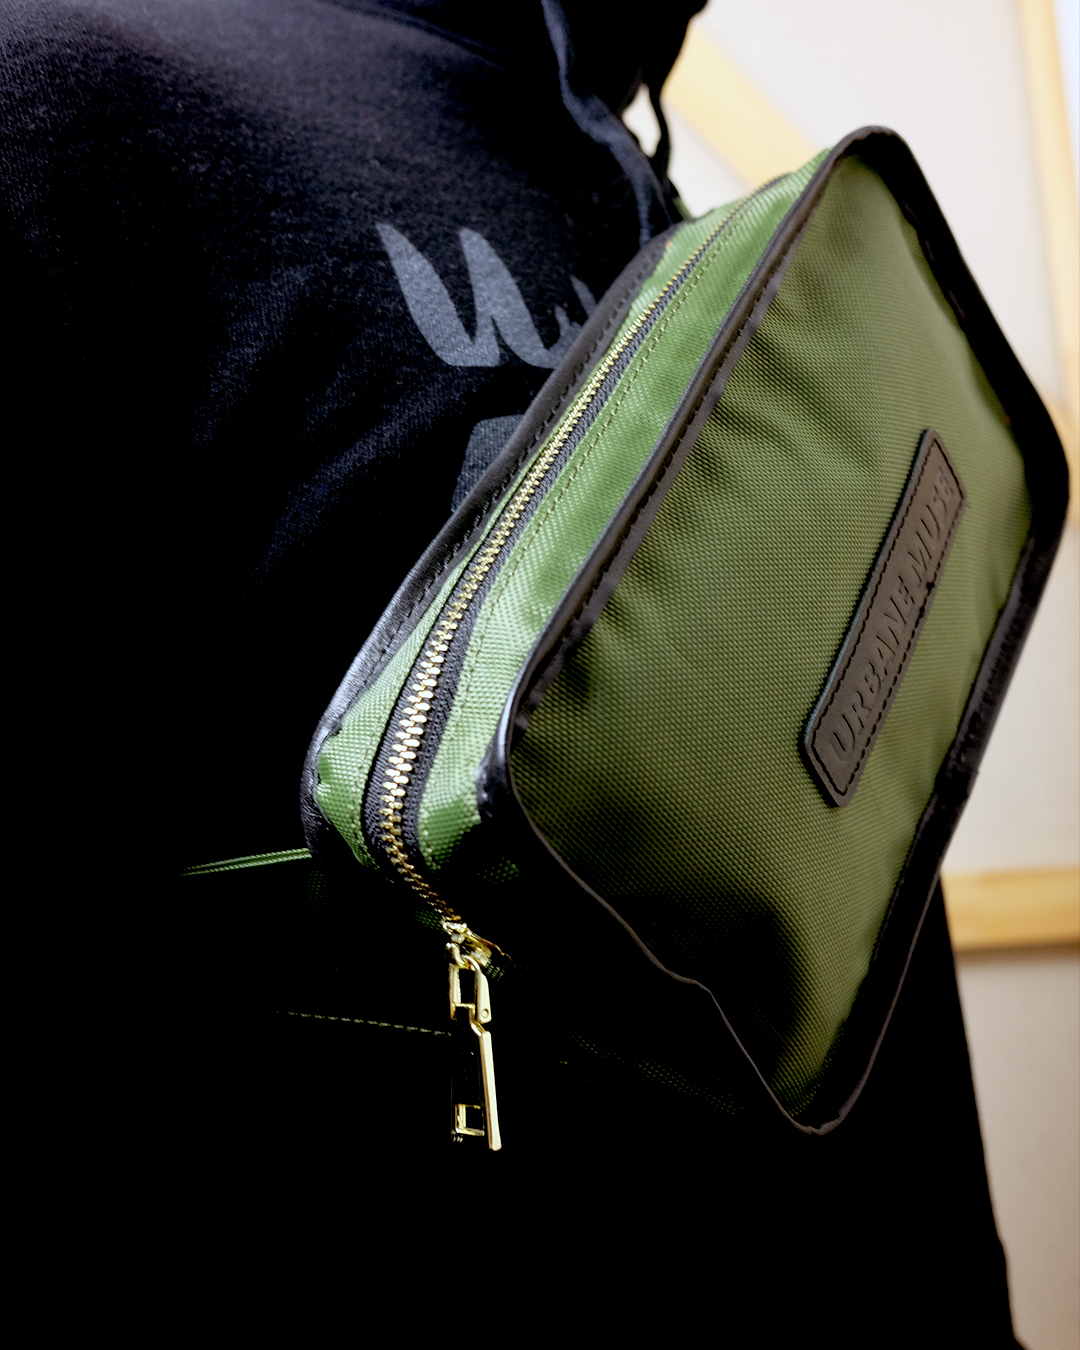 photo-1d-Modeling-Belt-Bag-Backpack-URBANE-MUSE-CHRIS-SMITH